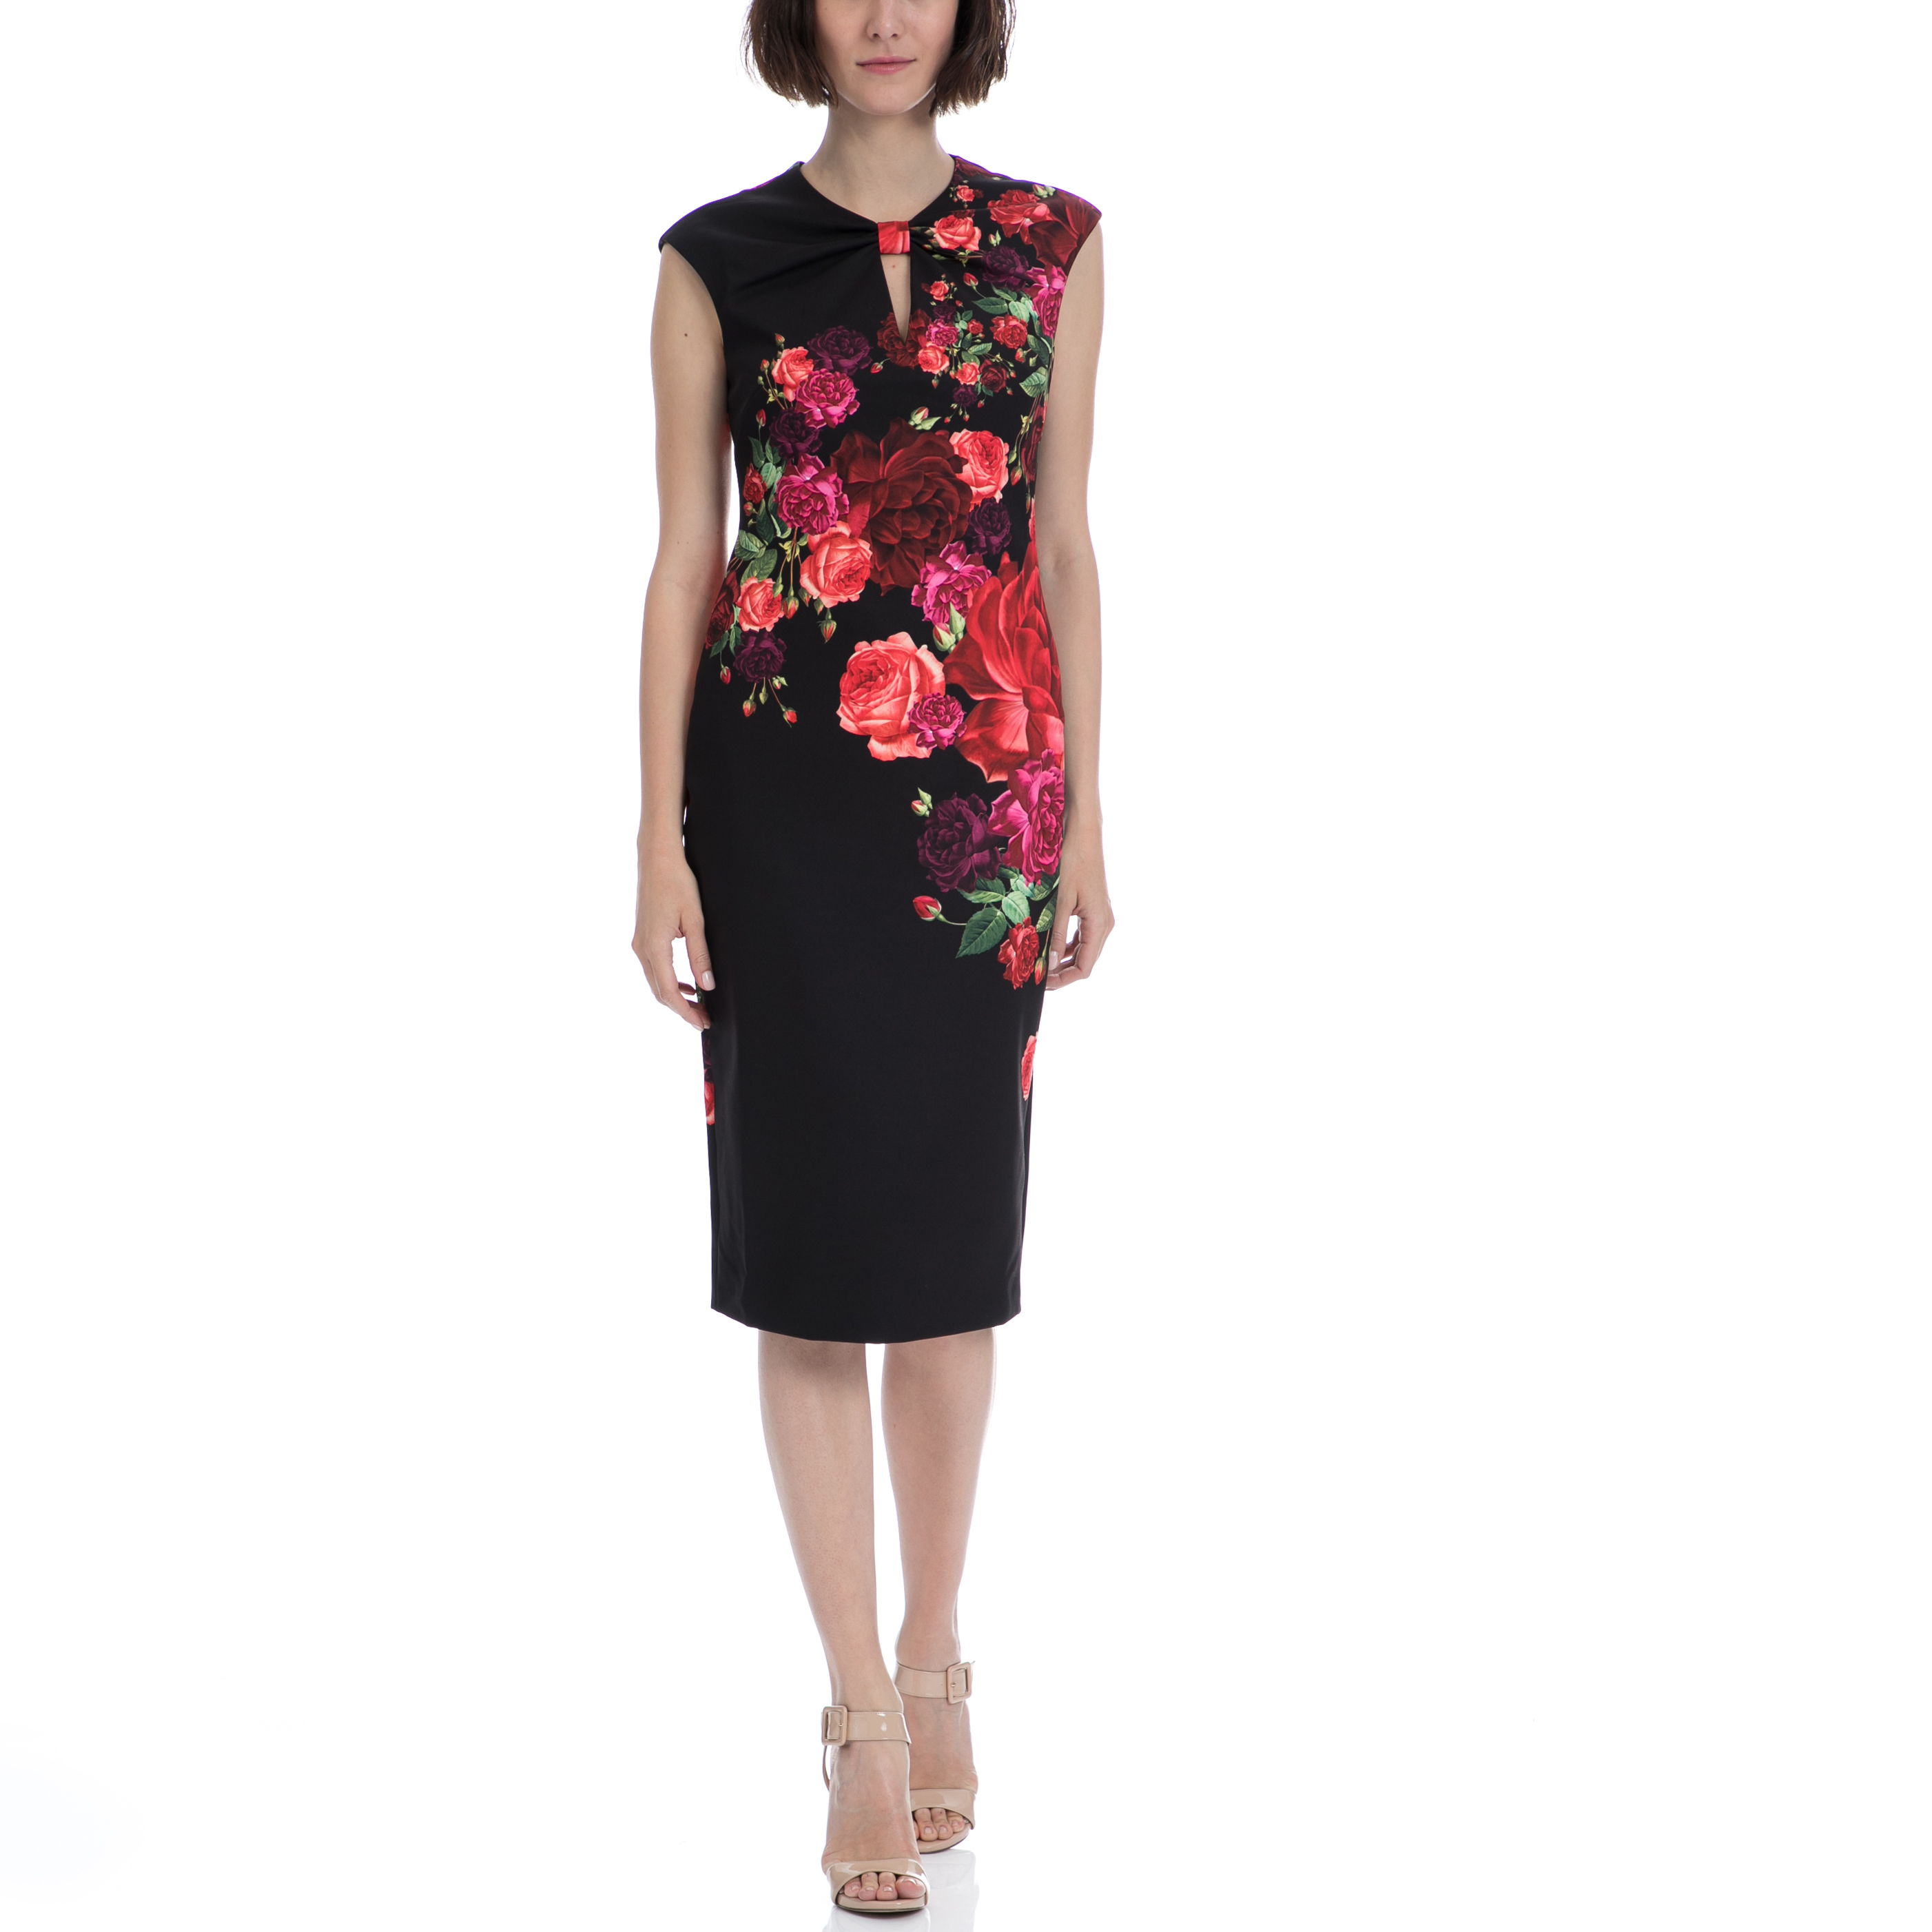 TED BAKER - Μίντι φόρεμα TED BAKER MIRRIE JUXTAPOSE ROSE KNOT DRESS μαύρο φλοράλ γυναικεία ρούχα φορέματα μέχρι το γόνατο